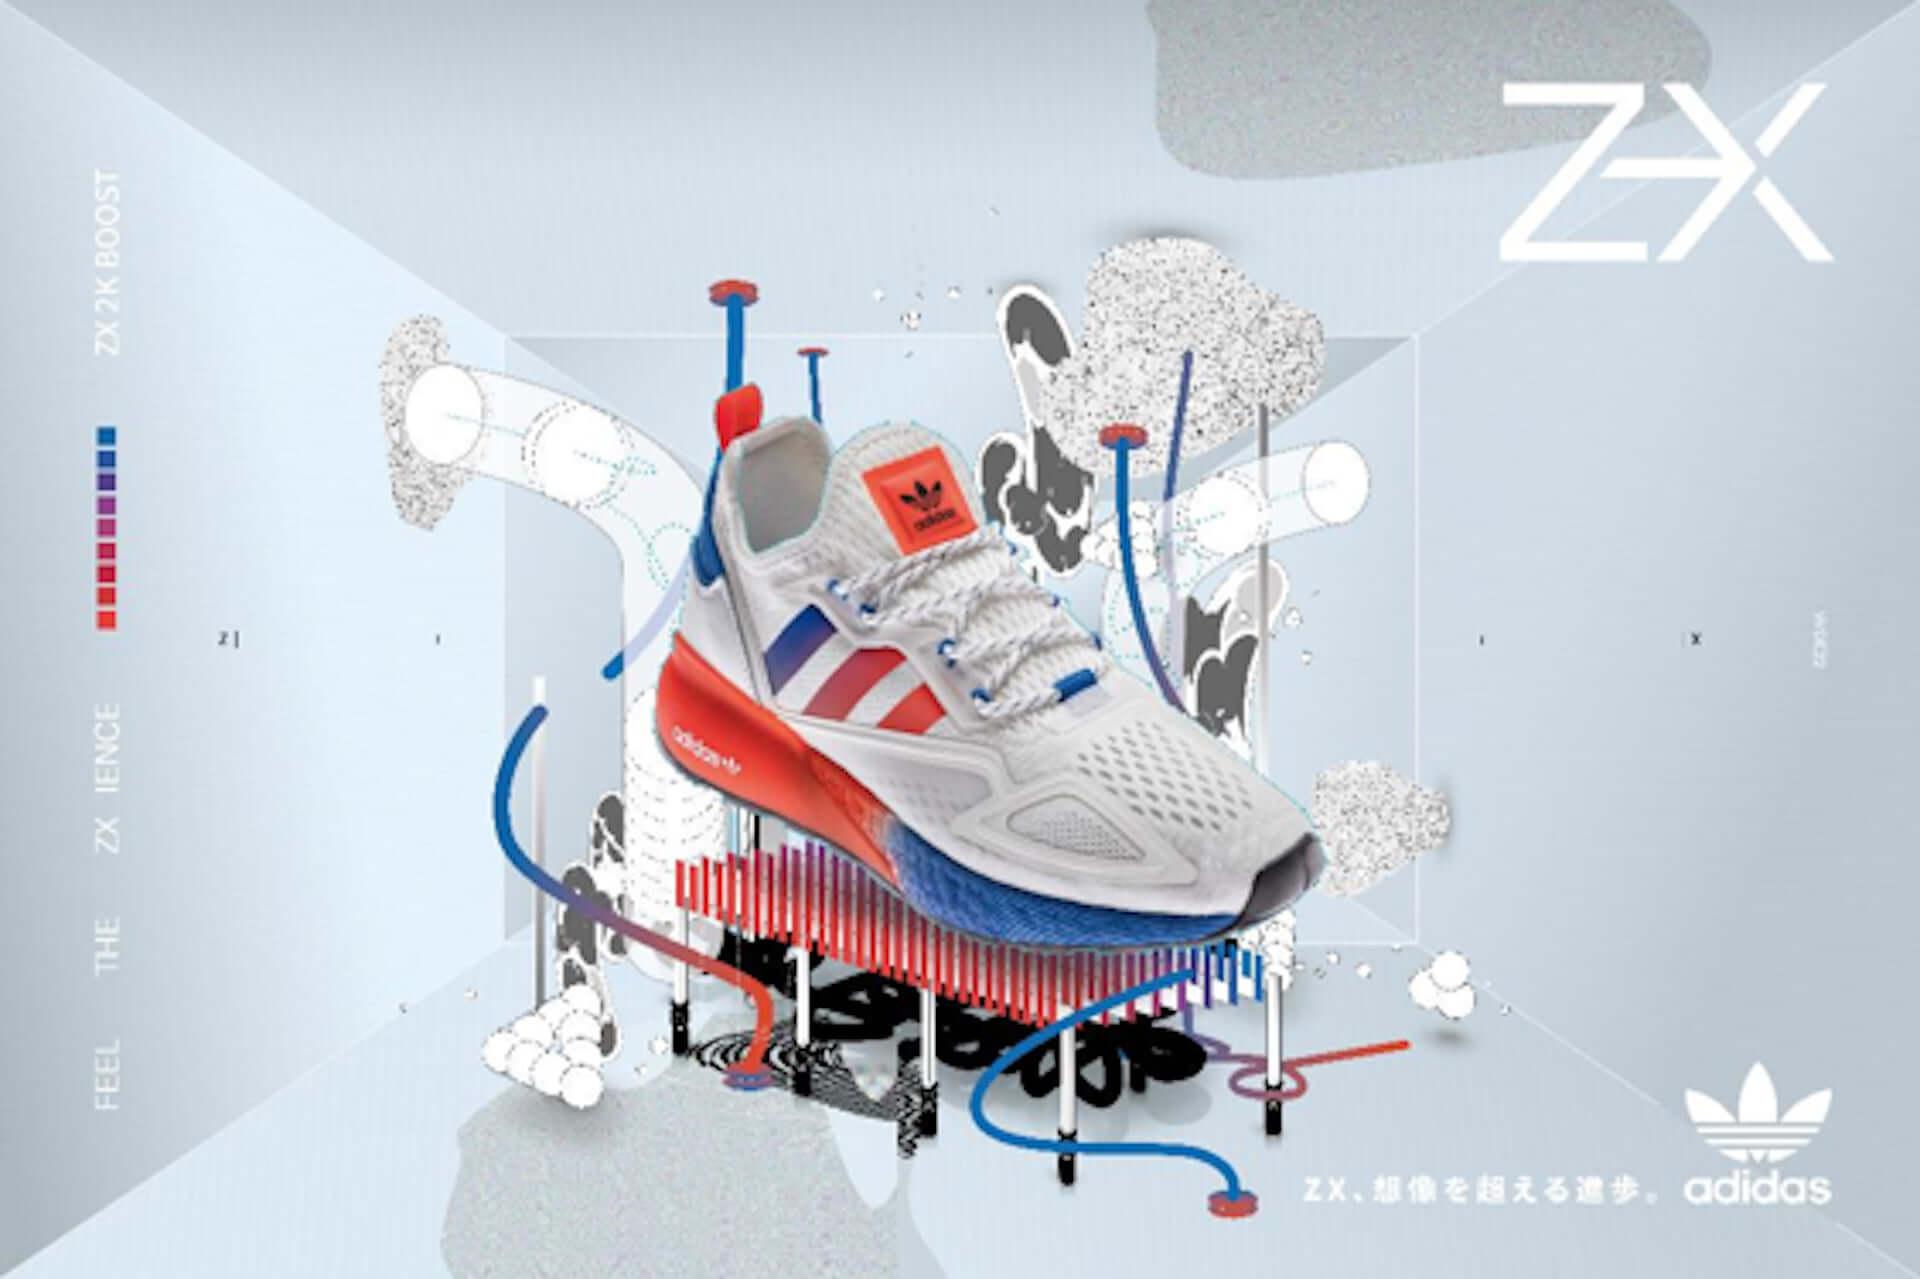 adidas Originalsの「ZX」シリーズから最新モデル『ZX 2K BOOST』が登場!レイザーラモンRG、アントニー出演のIGライブも開催決定 lf200817_adidas-zx_1-1920x1279